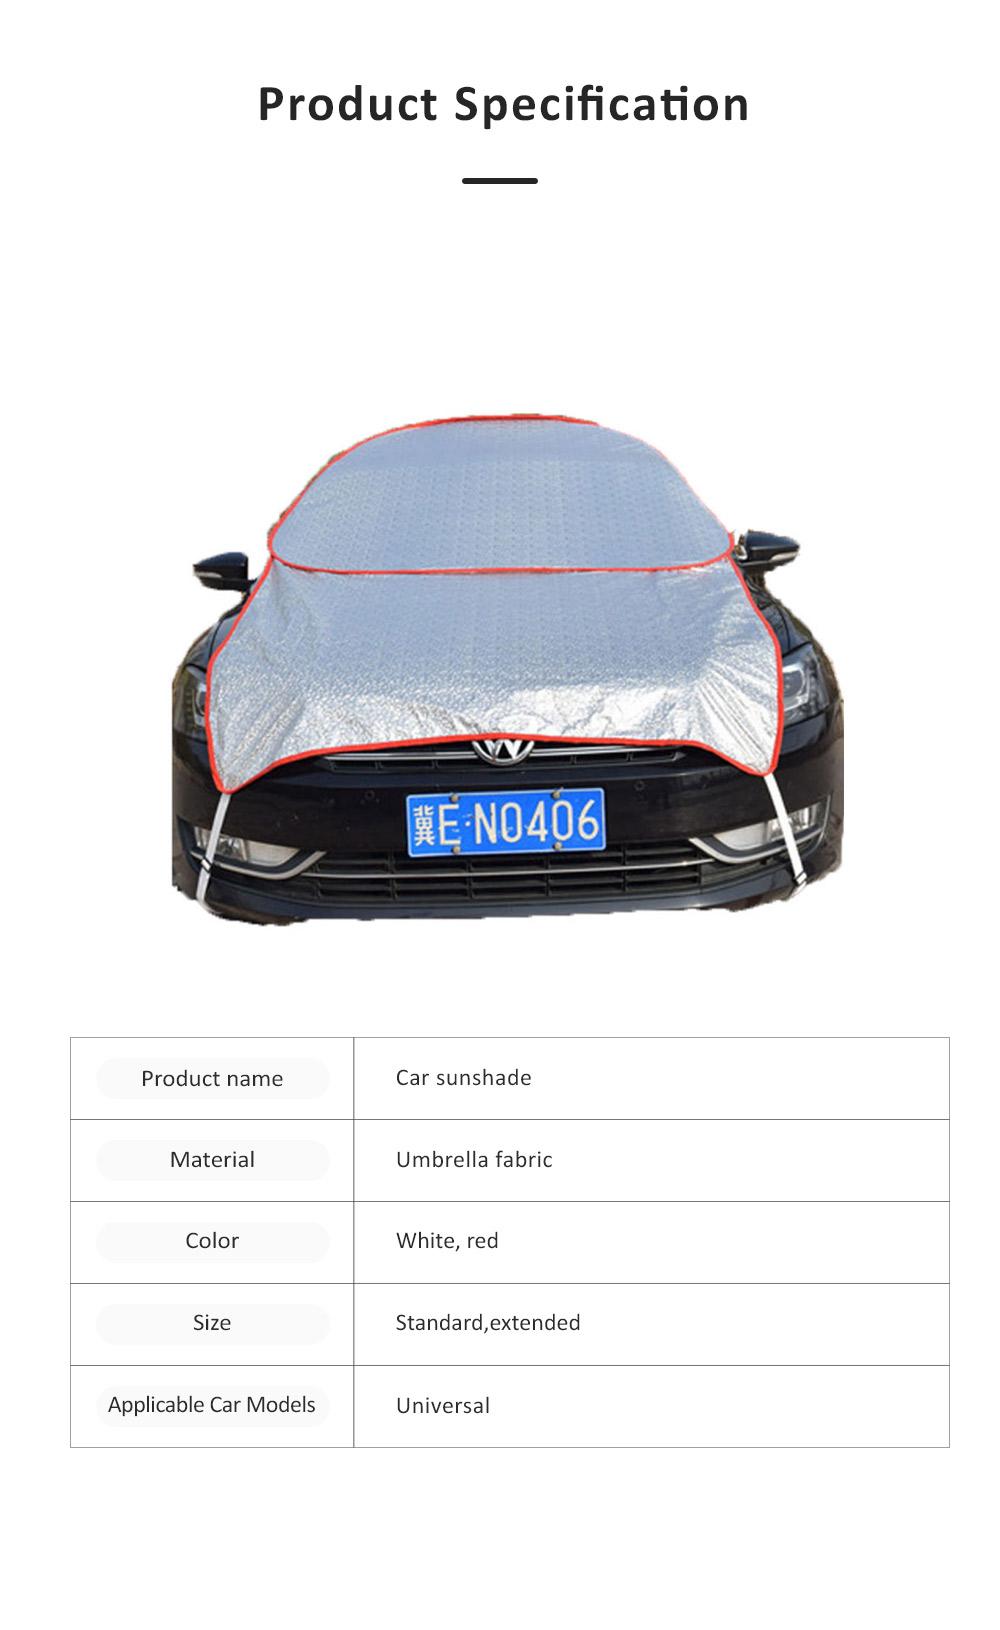 Universal Car Sunshade UV Ray Protector Cooler Umbrella Fabric Sunshade for Cars 6